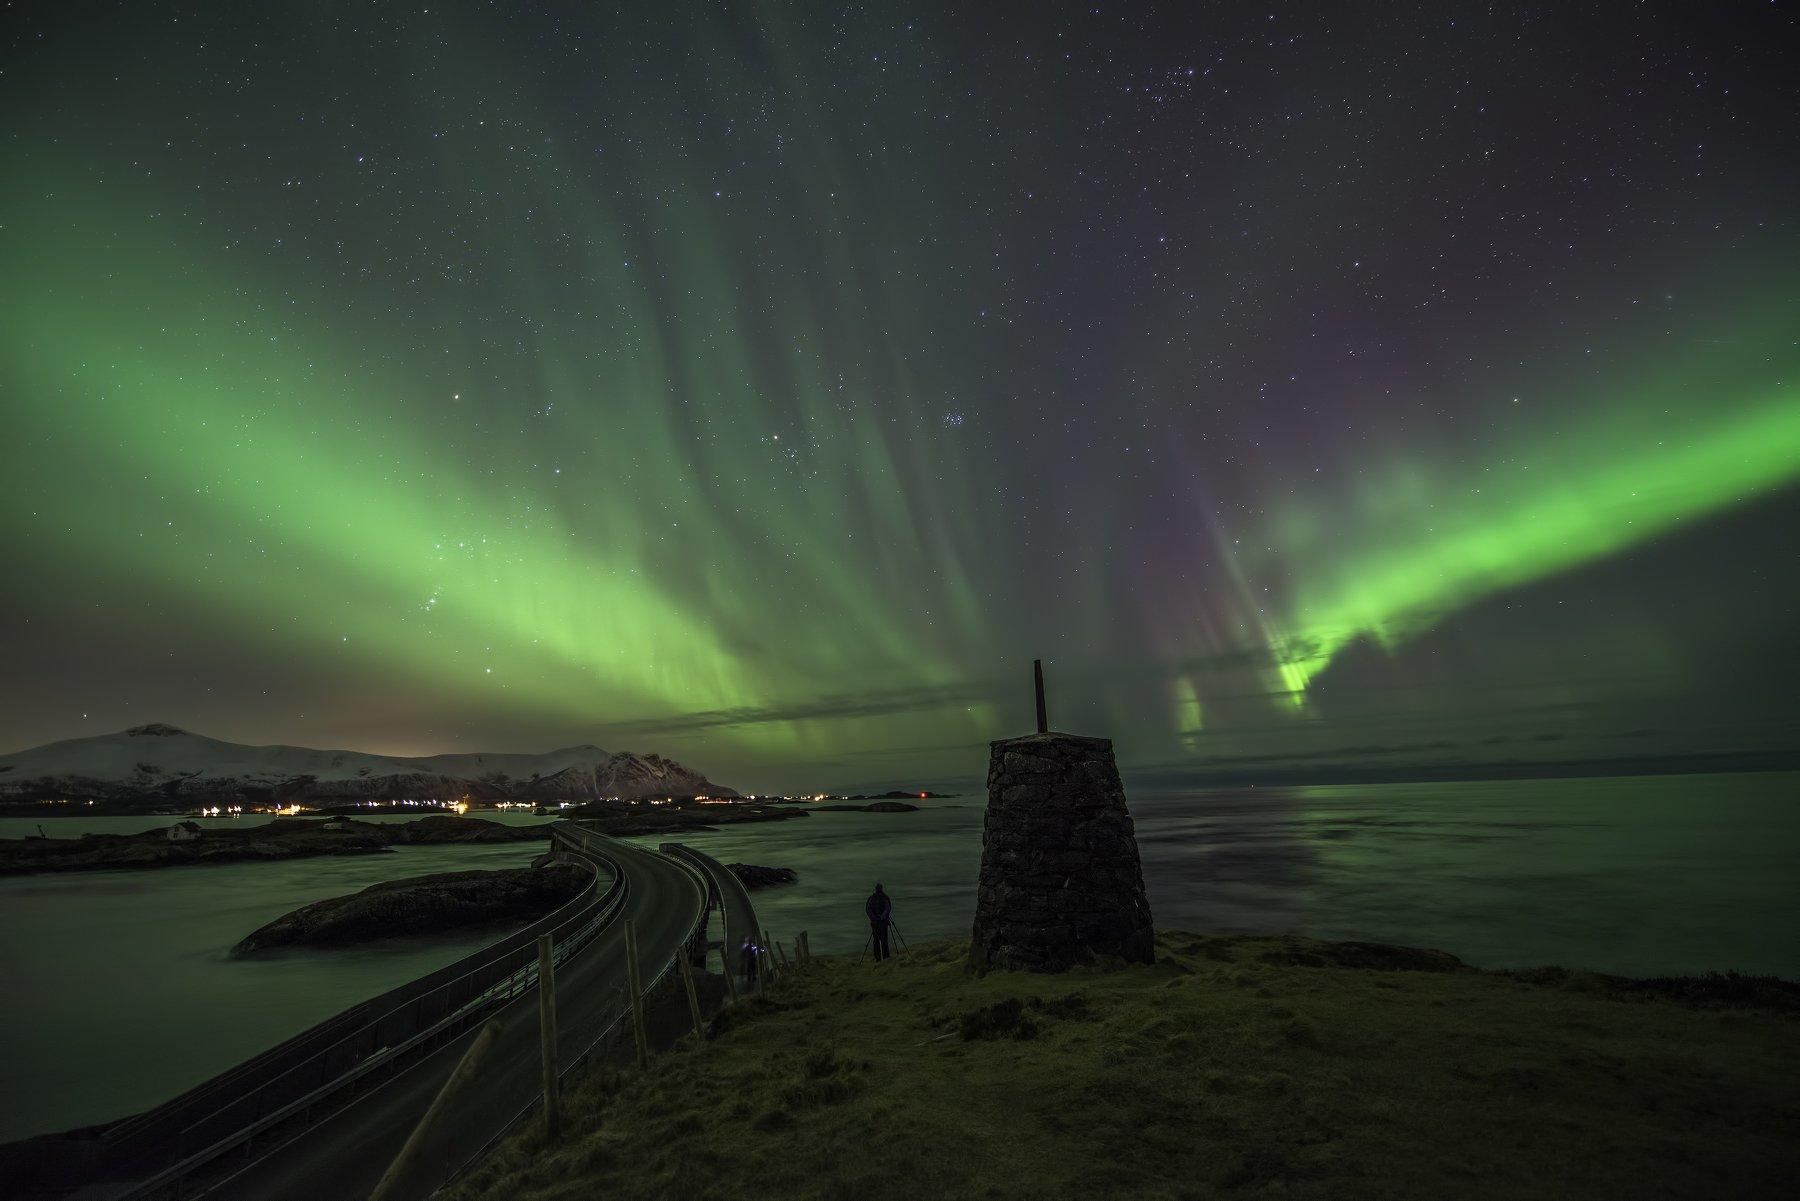 aurora, atlantic ocean road, atlanterhavsveien, norway, more og romsdal, night, landscape, stars, sky, green, bridge, Sylwia Grabinska